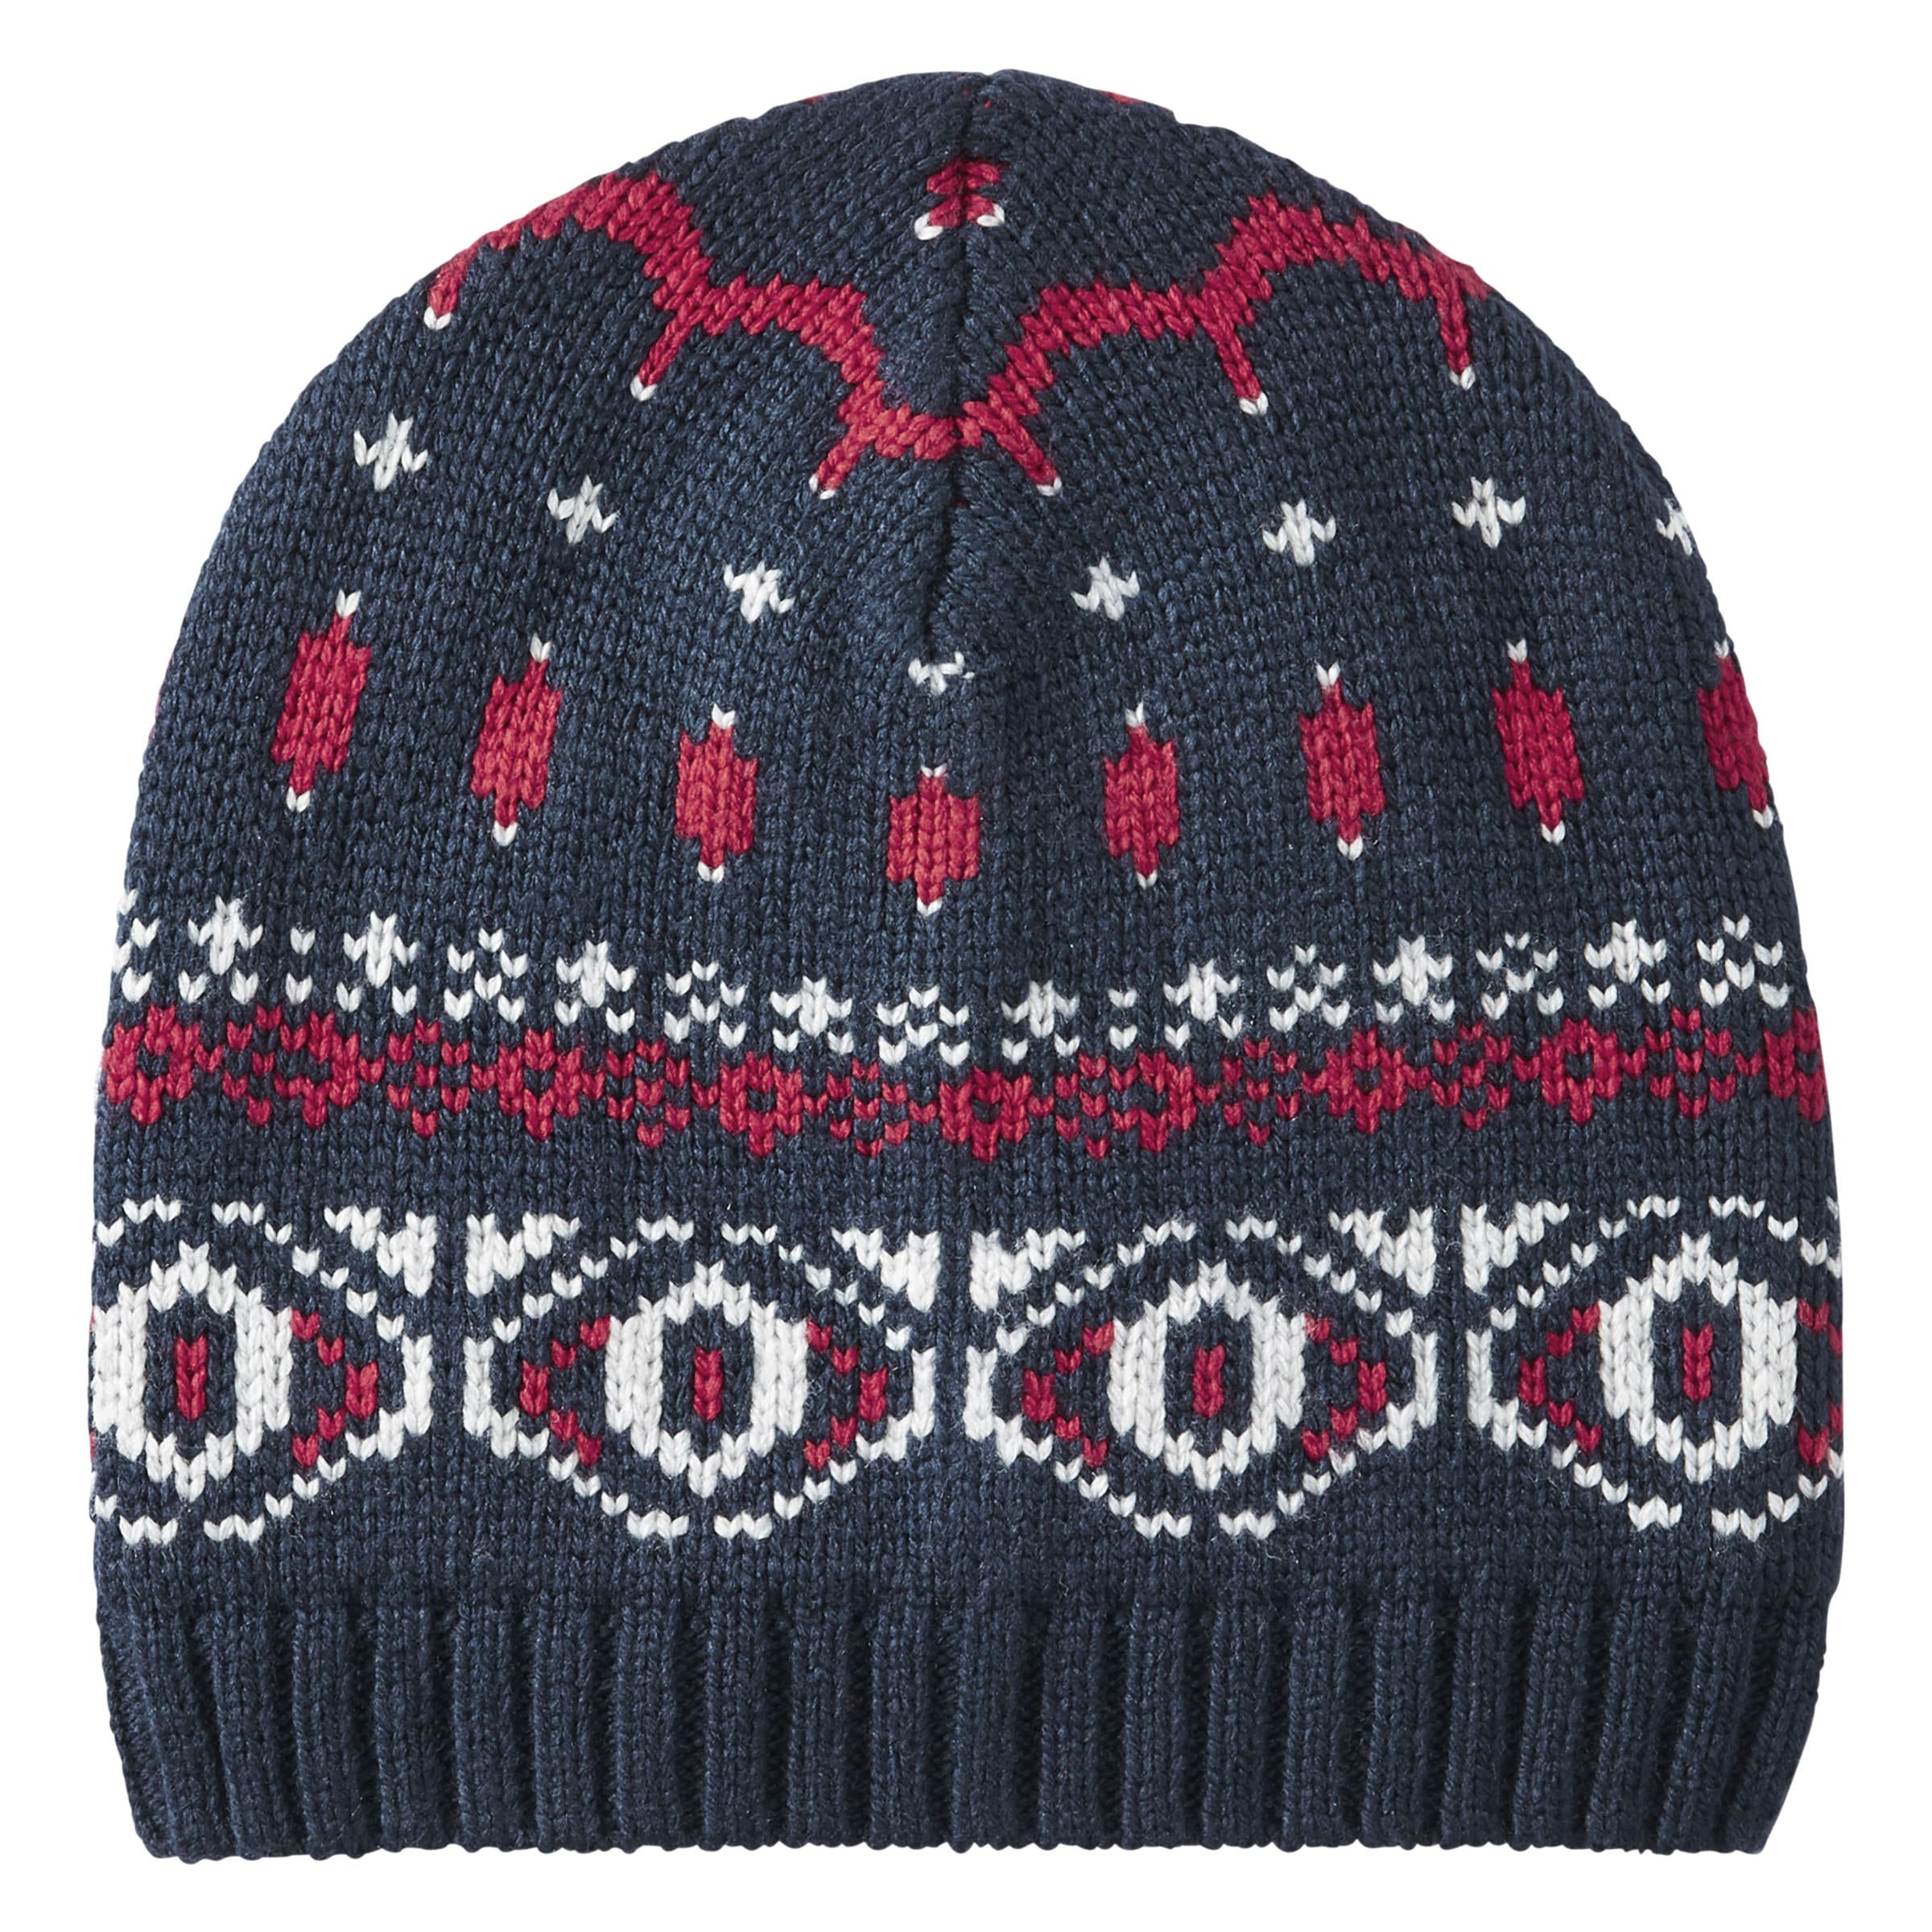 Men\'s Fair Isle Knit Hat in JF Midnight Blue from Joe Fresh